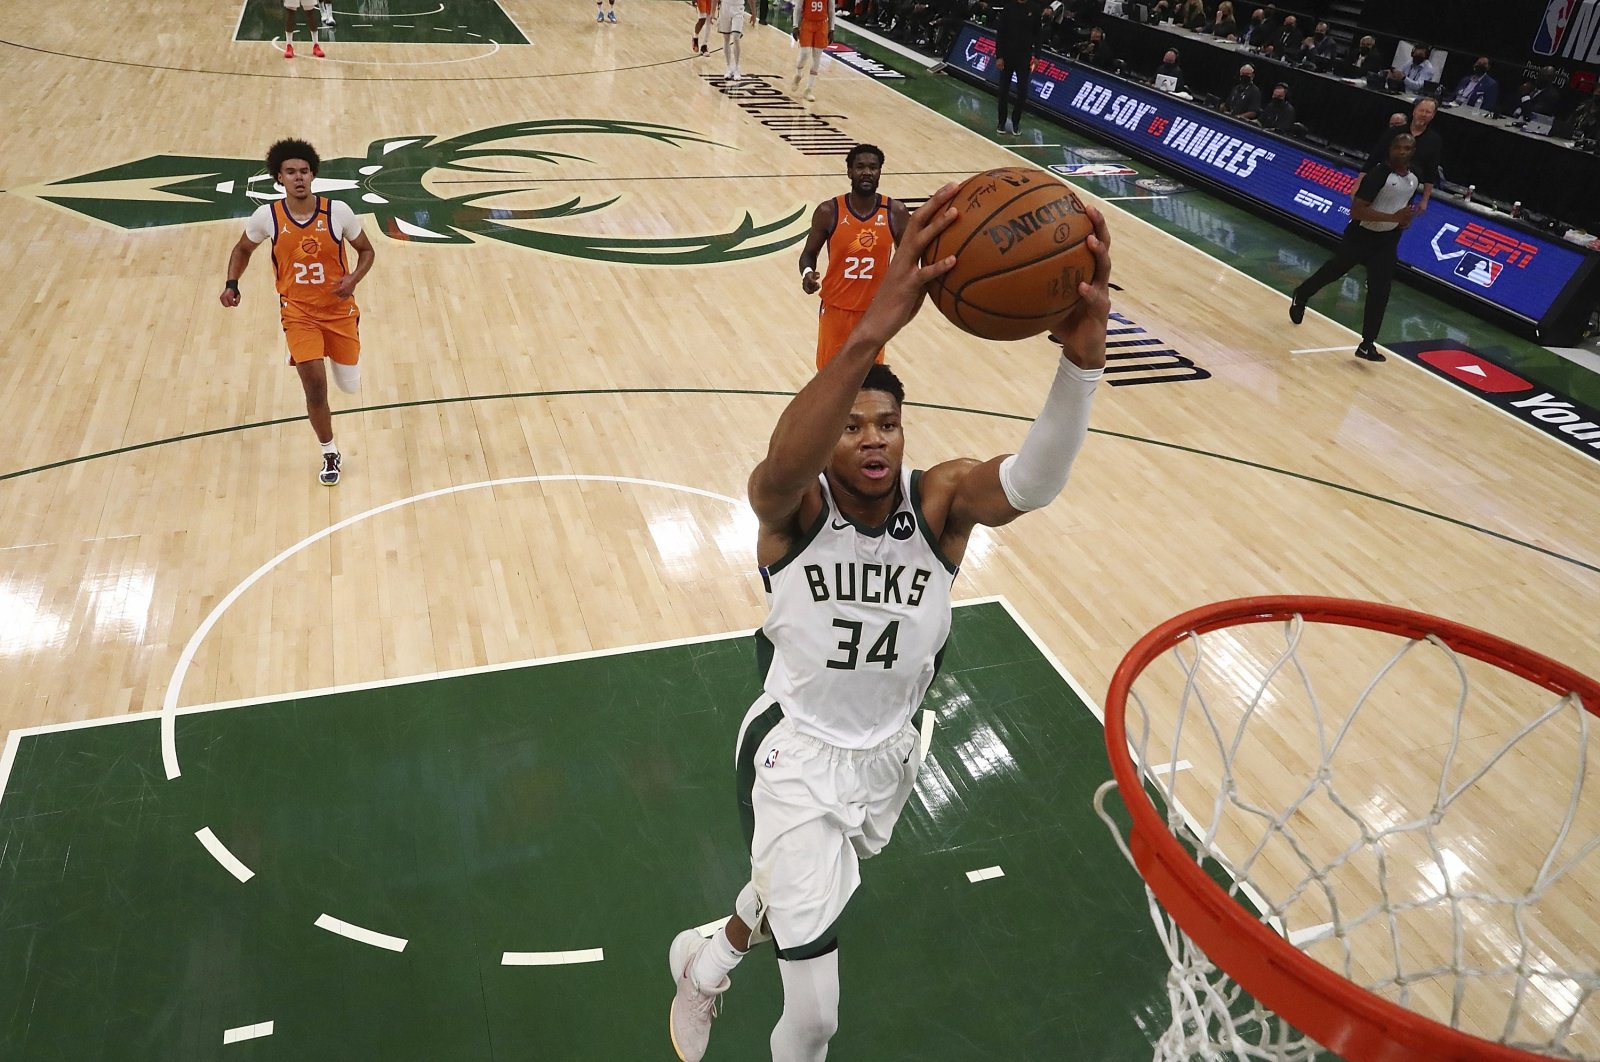 Milwaukee Bucks forward Giannis Antetokounmpo drives to the basket against the Phoenix Suns during NBA Finals Game 4, Milwaukee, Wisconsin, U.S., July 14, 2021. (AP Photo)